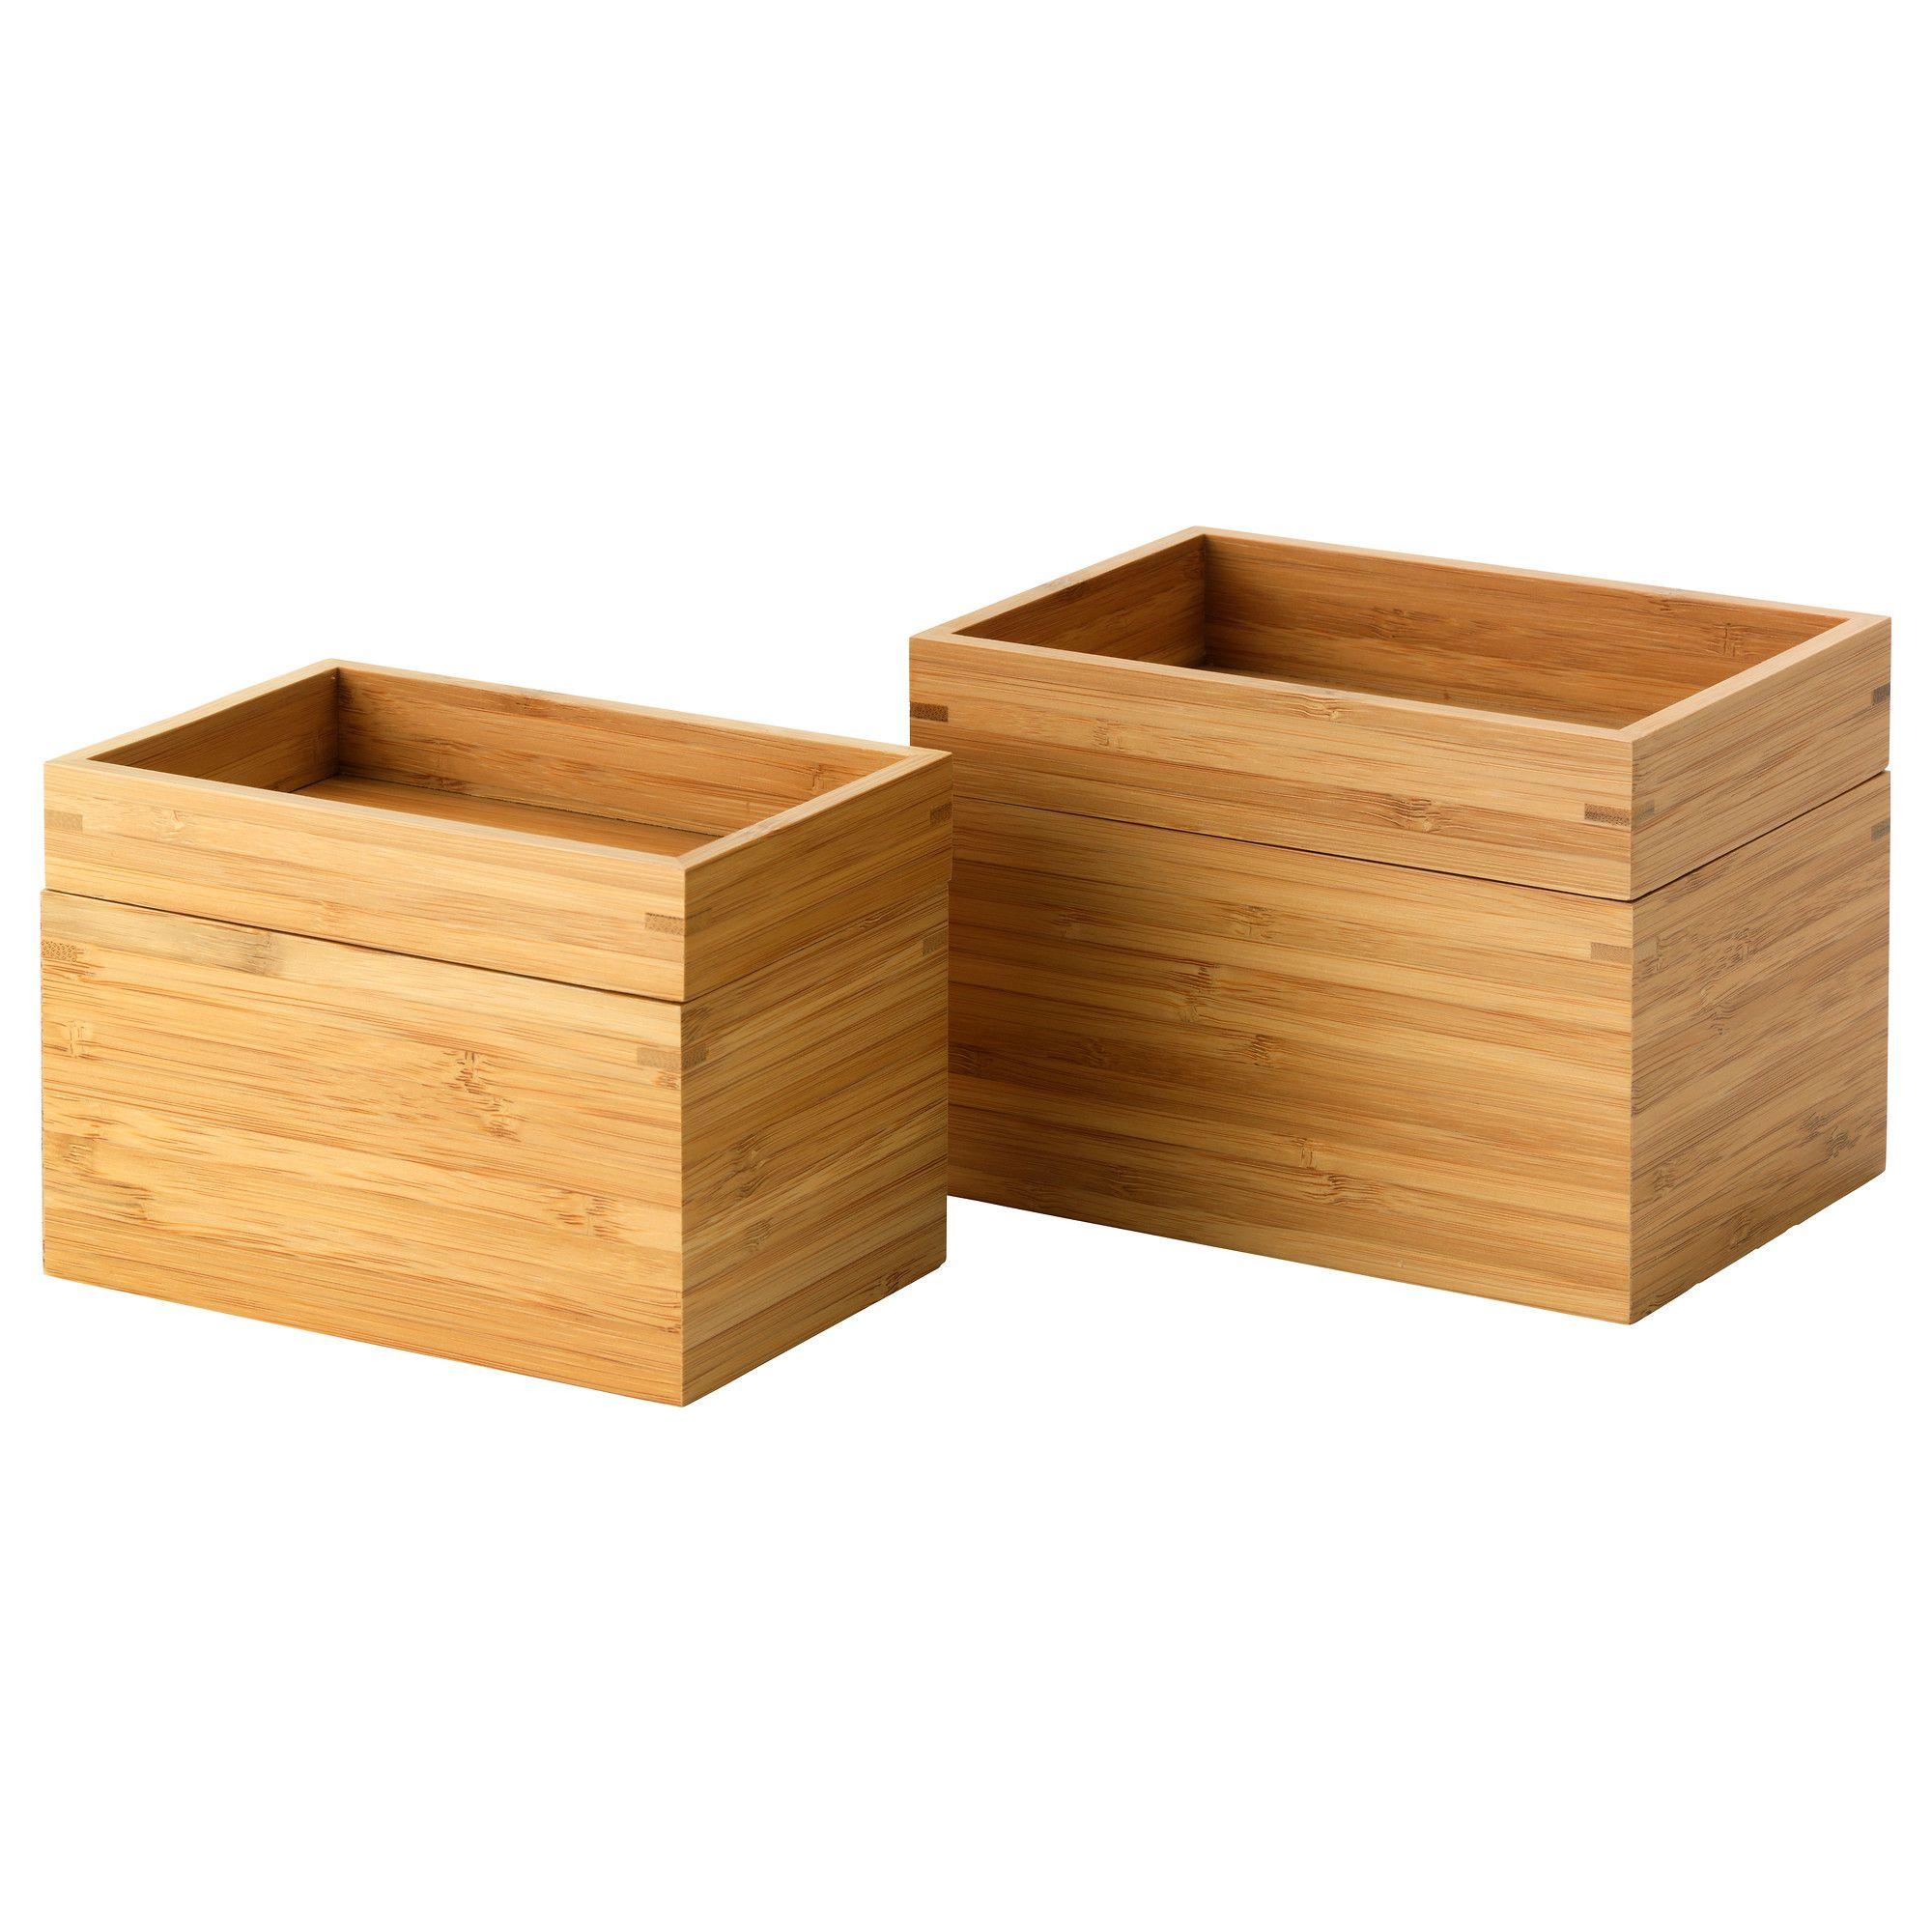 Dragan 2 Piece Box With Lid Tray Bamboo Ikea Storageikea Bathroom